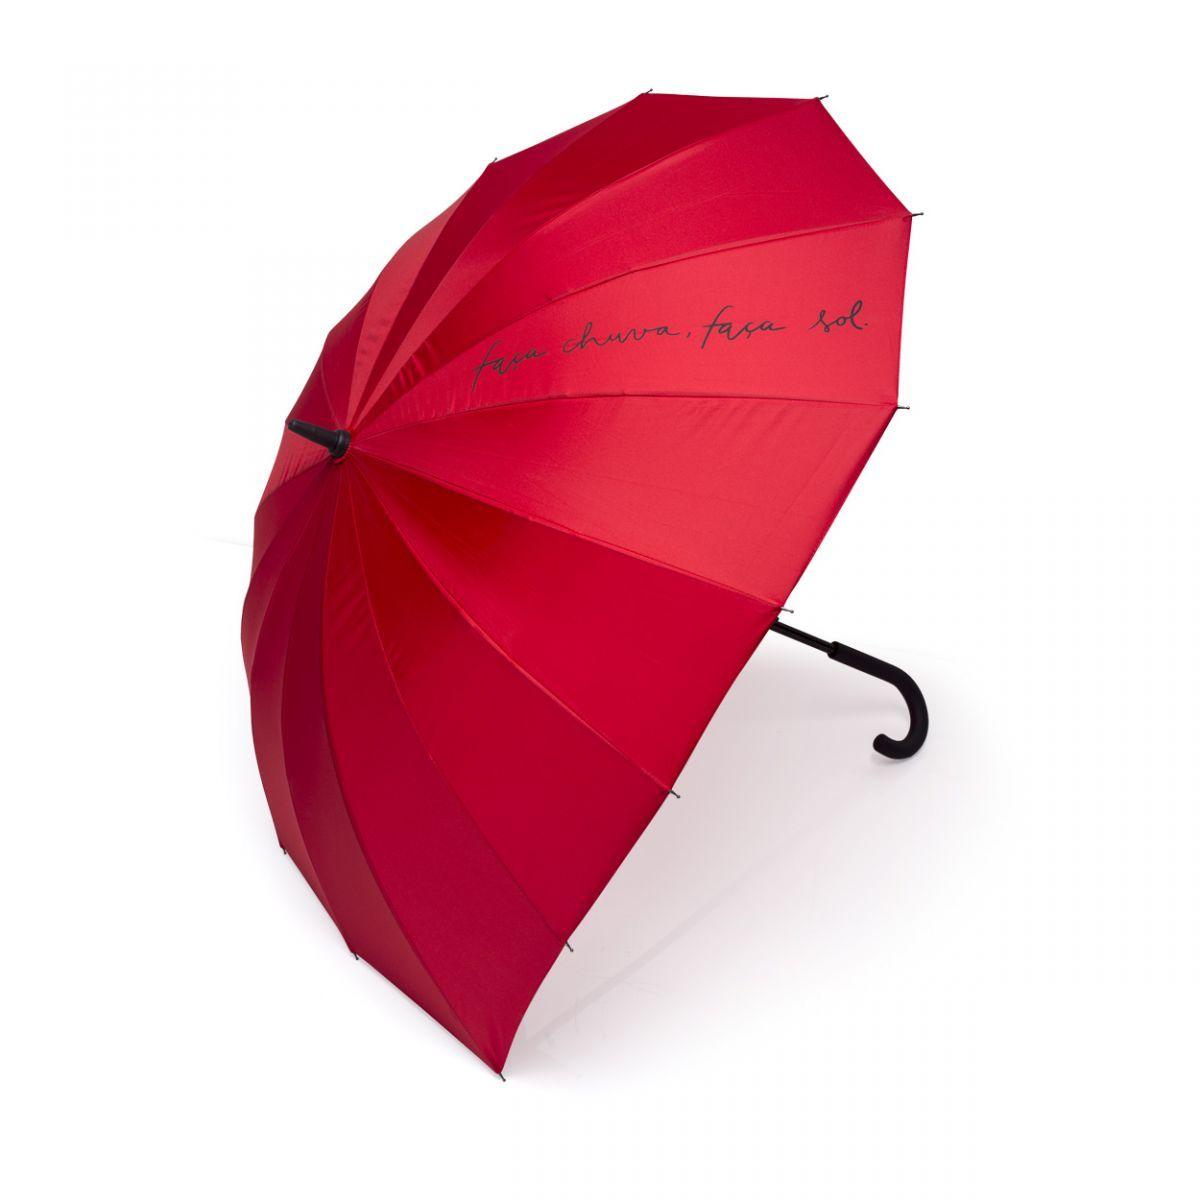 635ef5f2a Guarda chuva coracao - Imaginarium